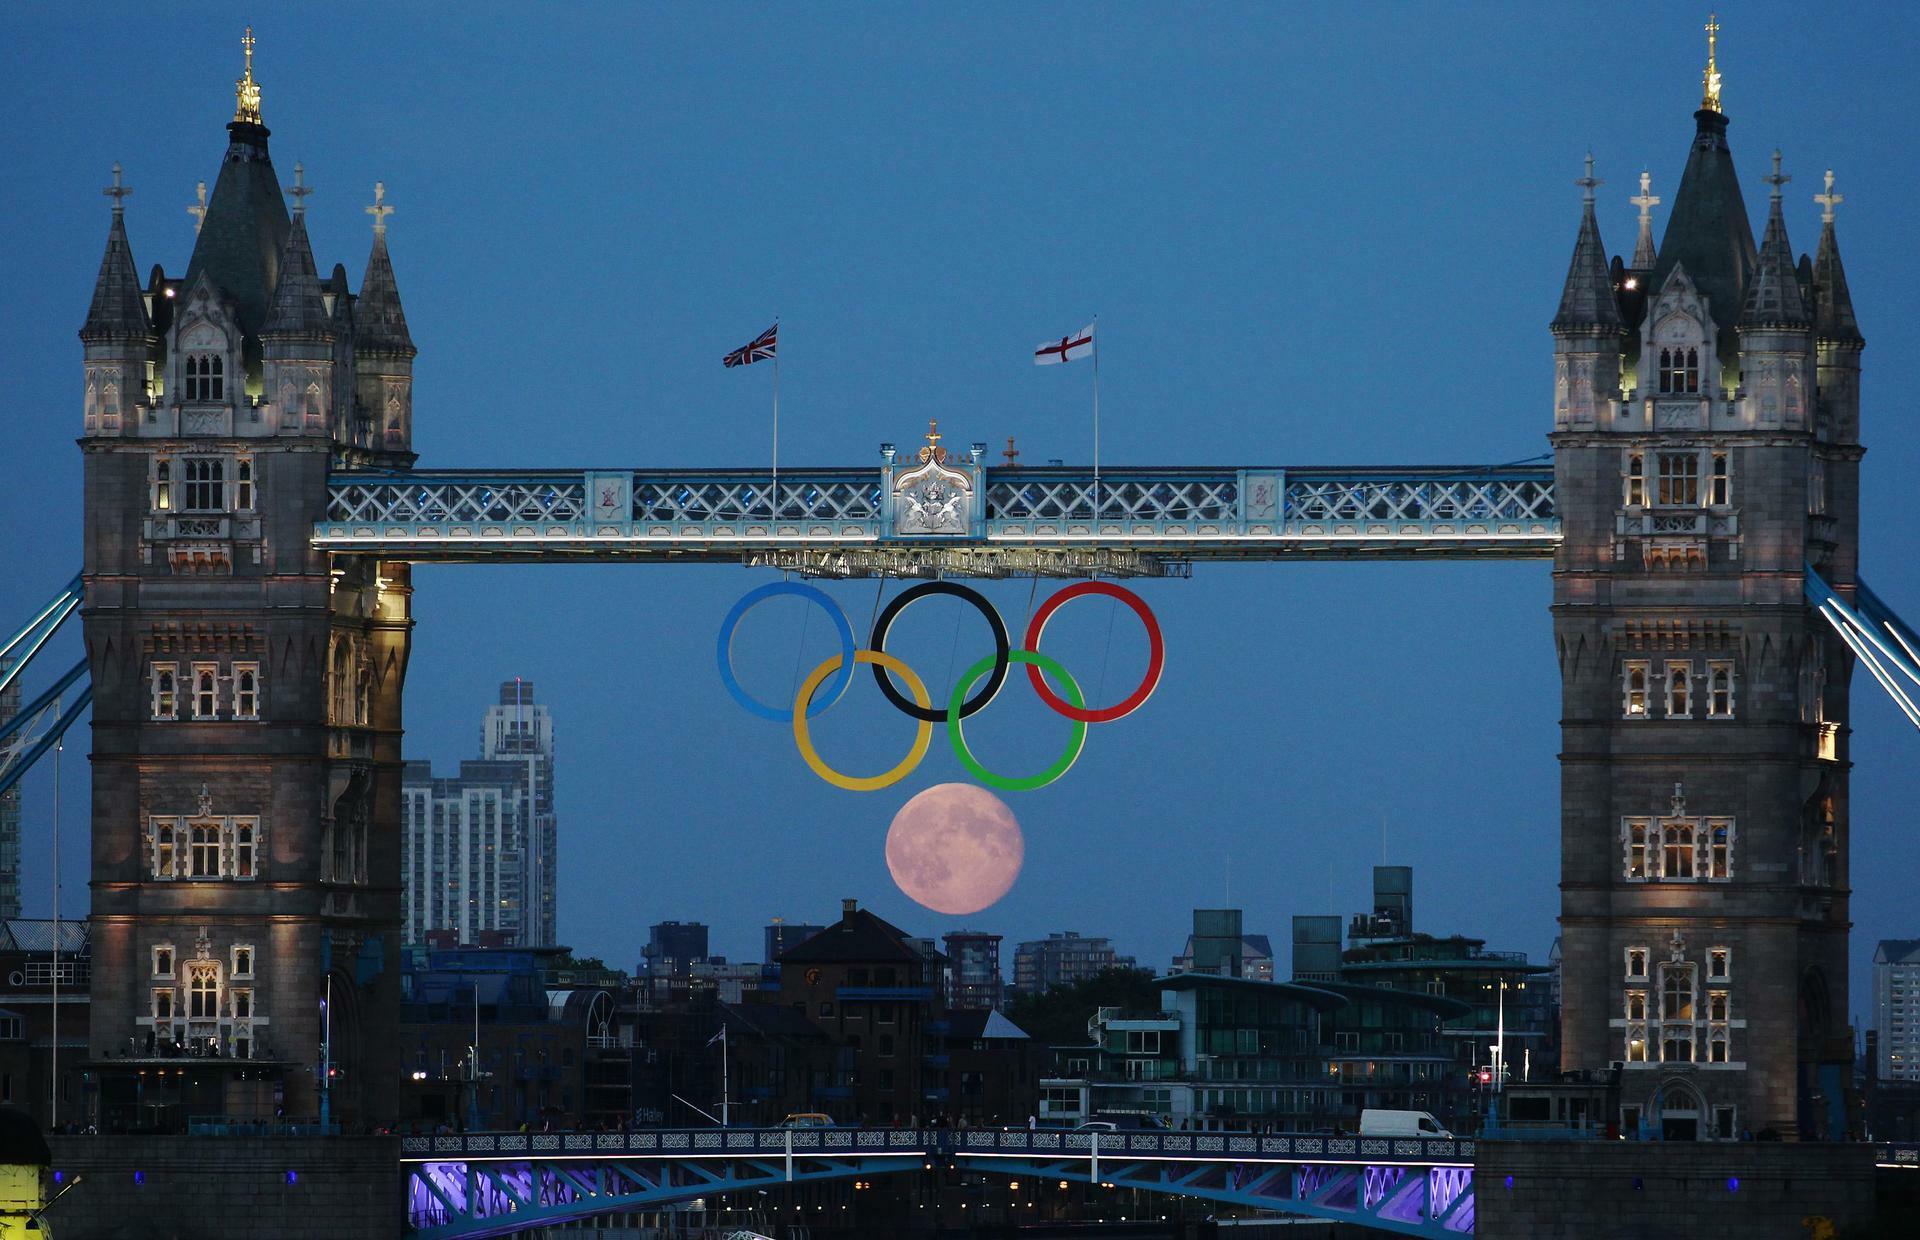 Die Tower Bridge in London. Quelle: Reuters